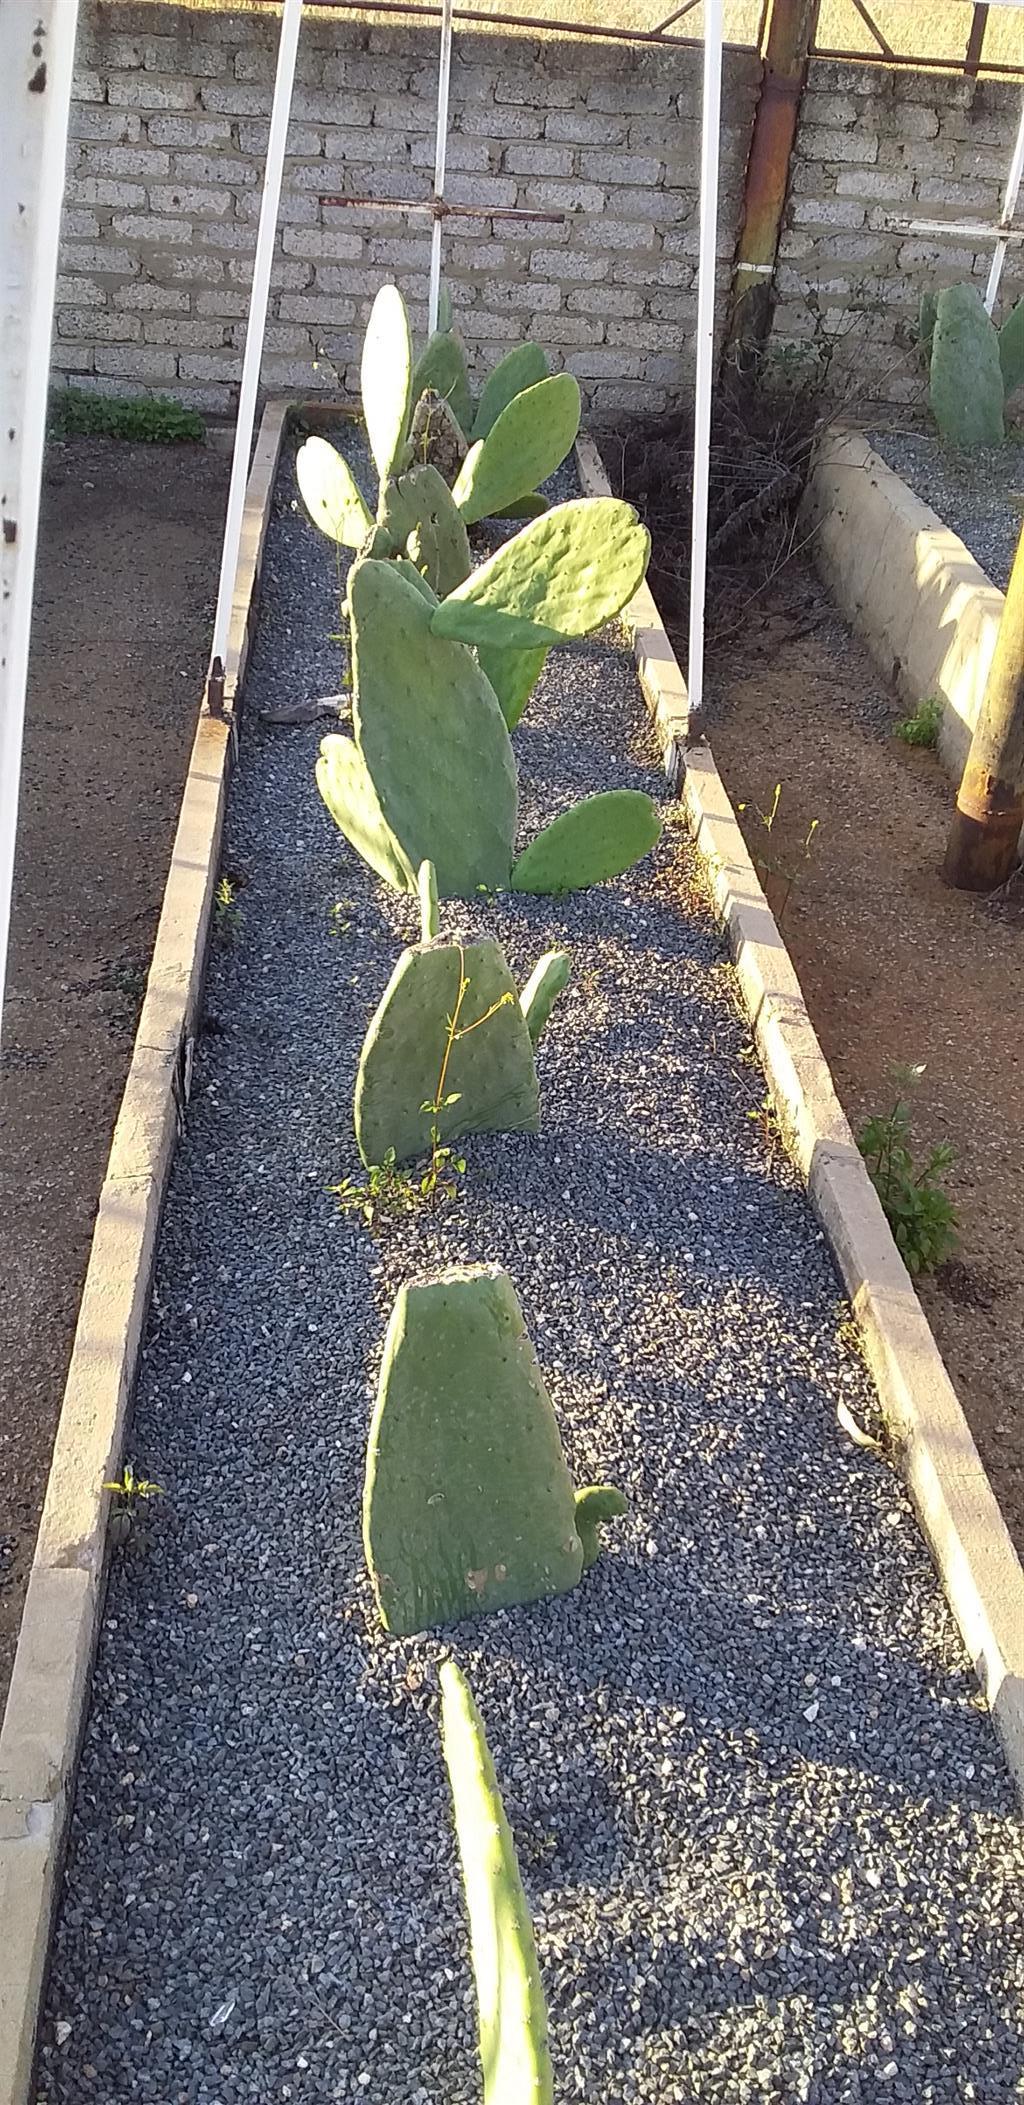 Prickley pear plants green